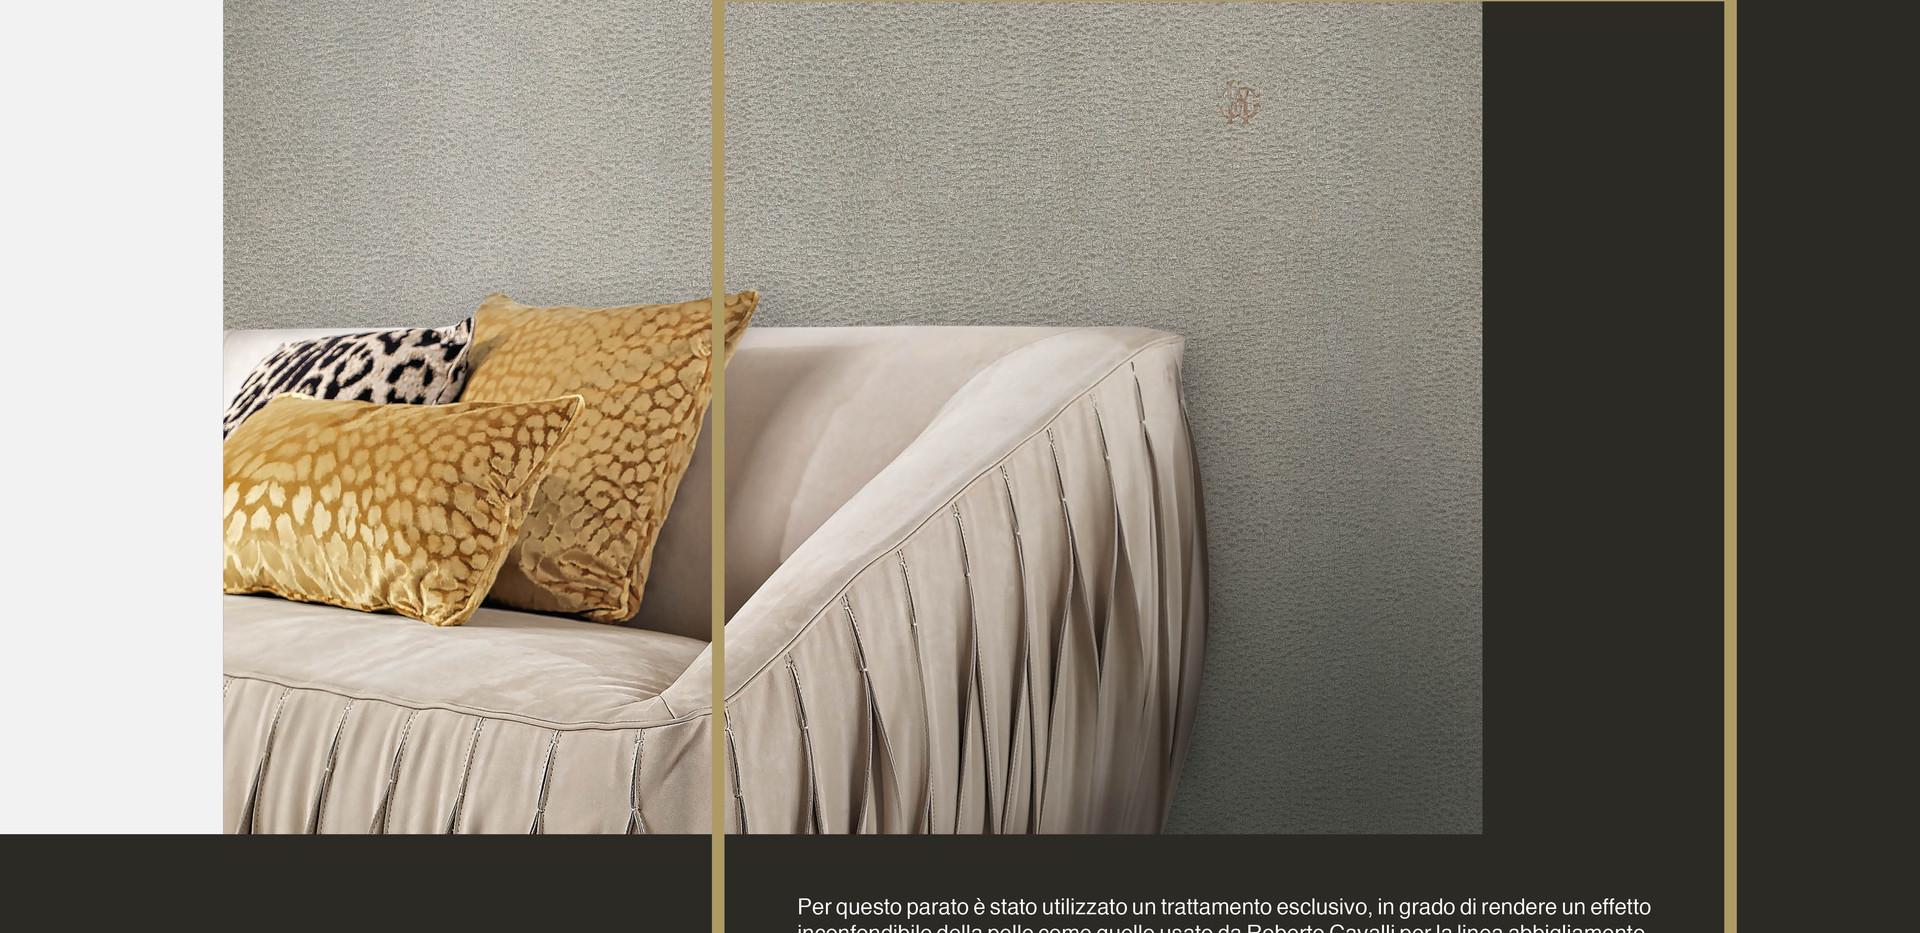 LifeNcolors-best-wallpaper-branded-luxury-pattern-texture-grey-light